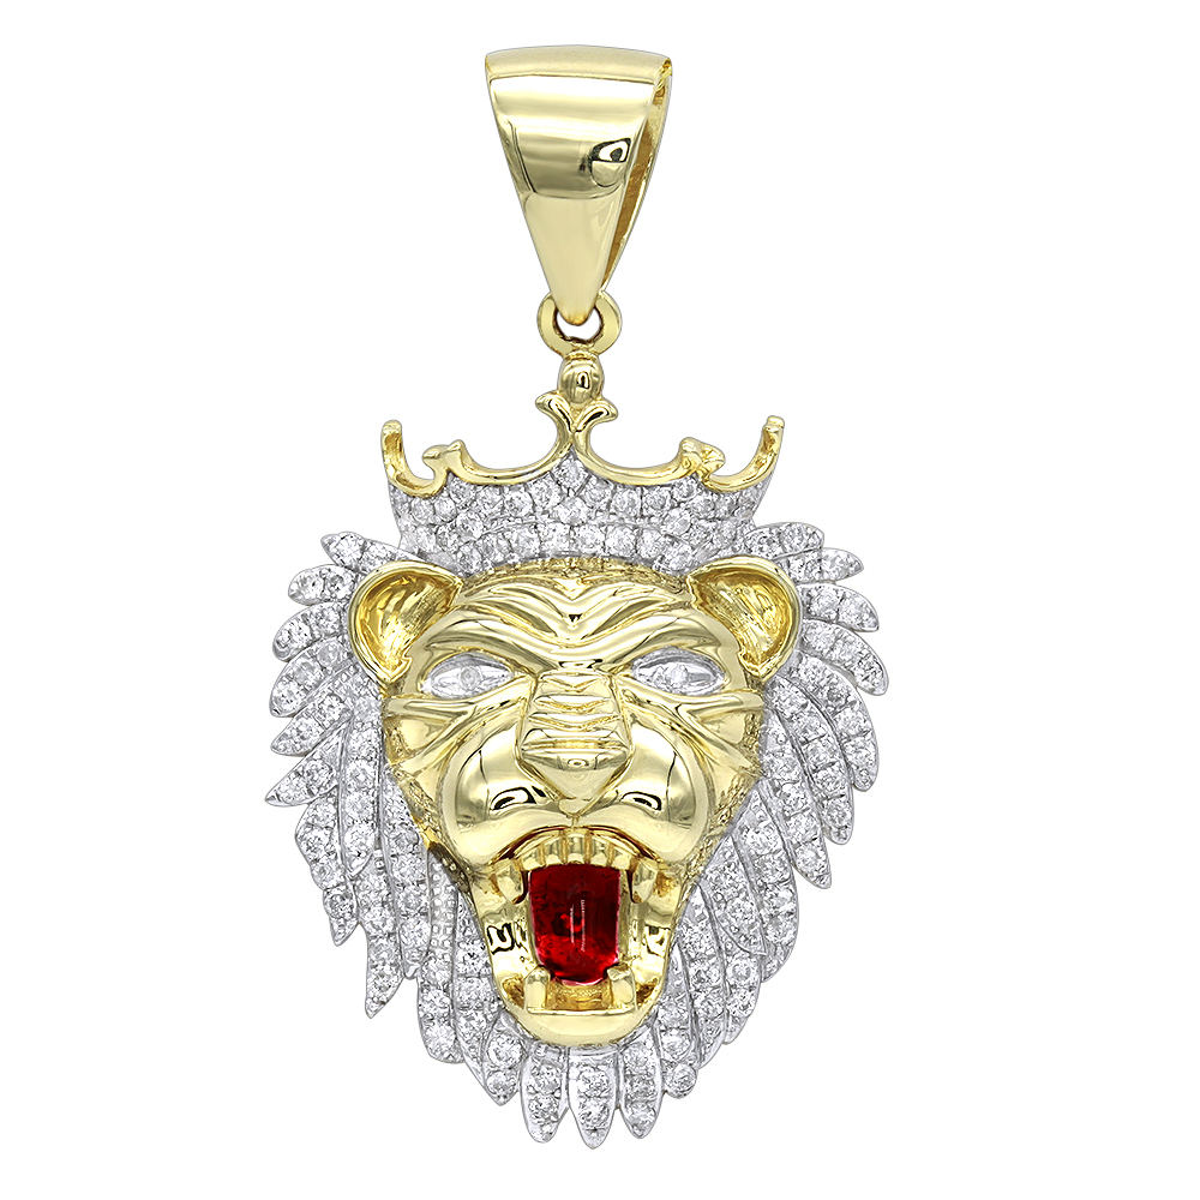 Solid 10K Gold Diamond King Lion Head Pendant for Men 1.2ct Luxurman Charm